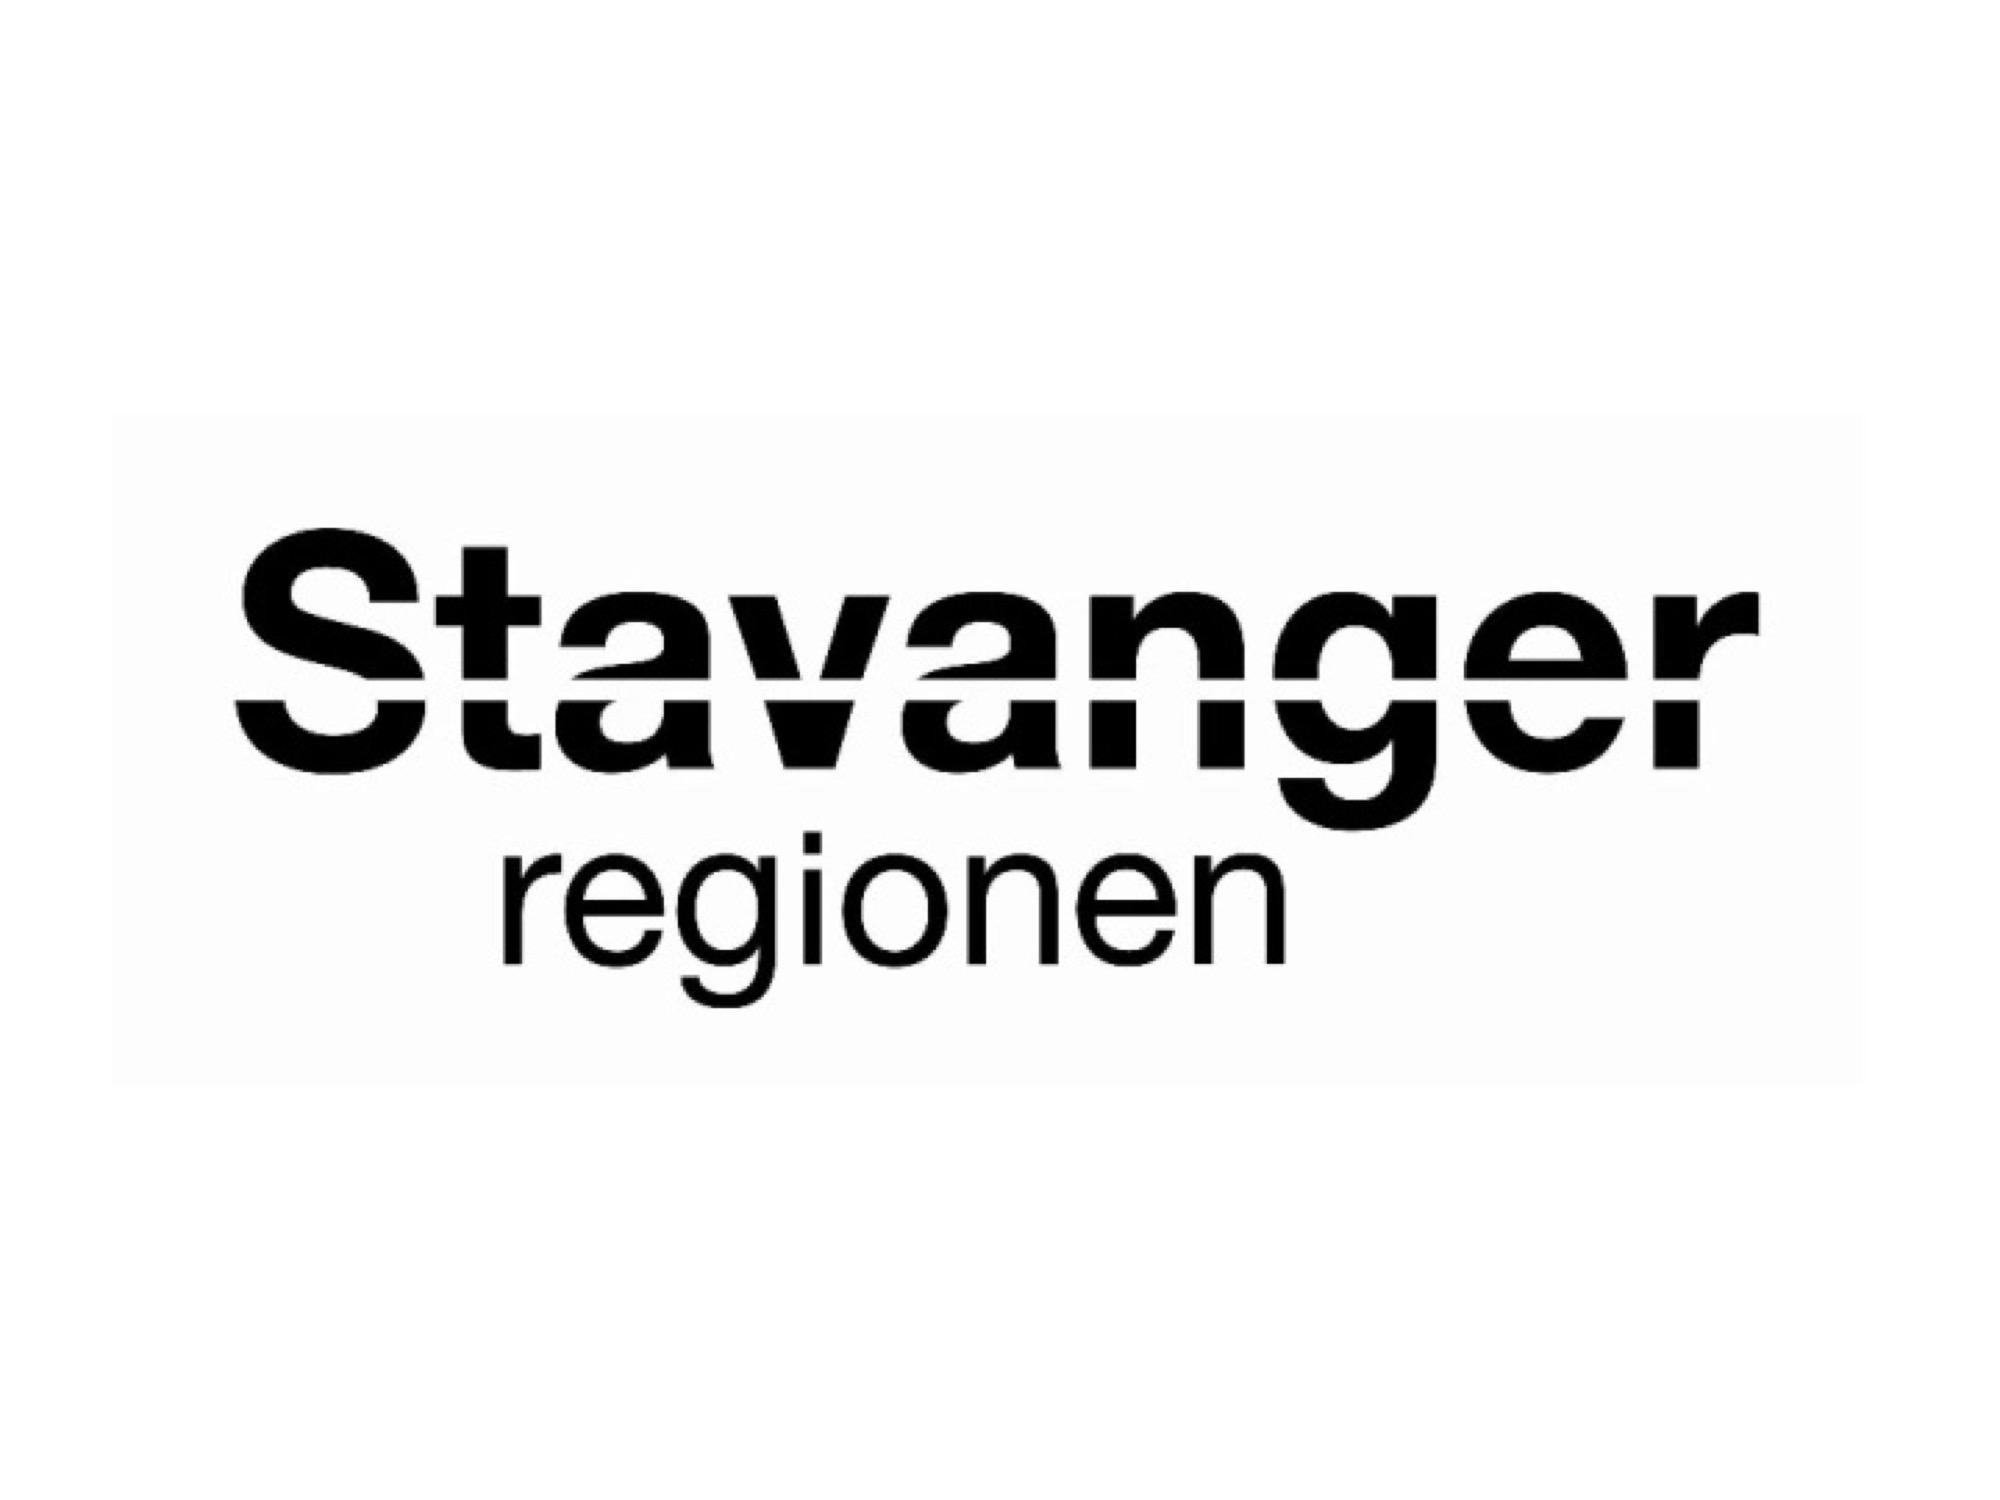 Stavanger Region.jpeg